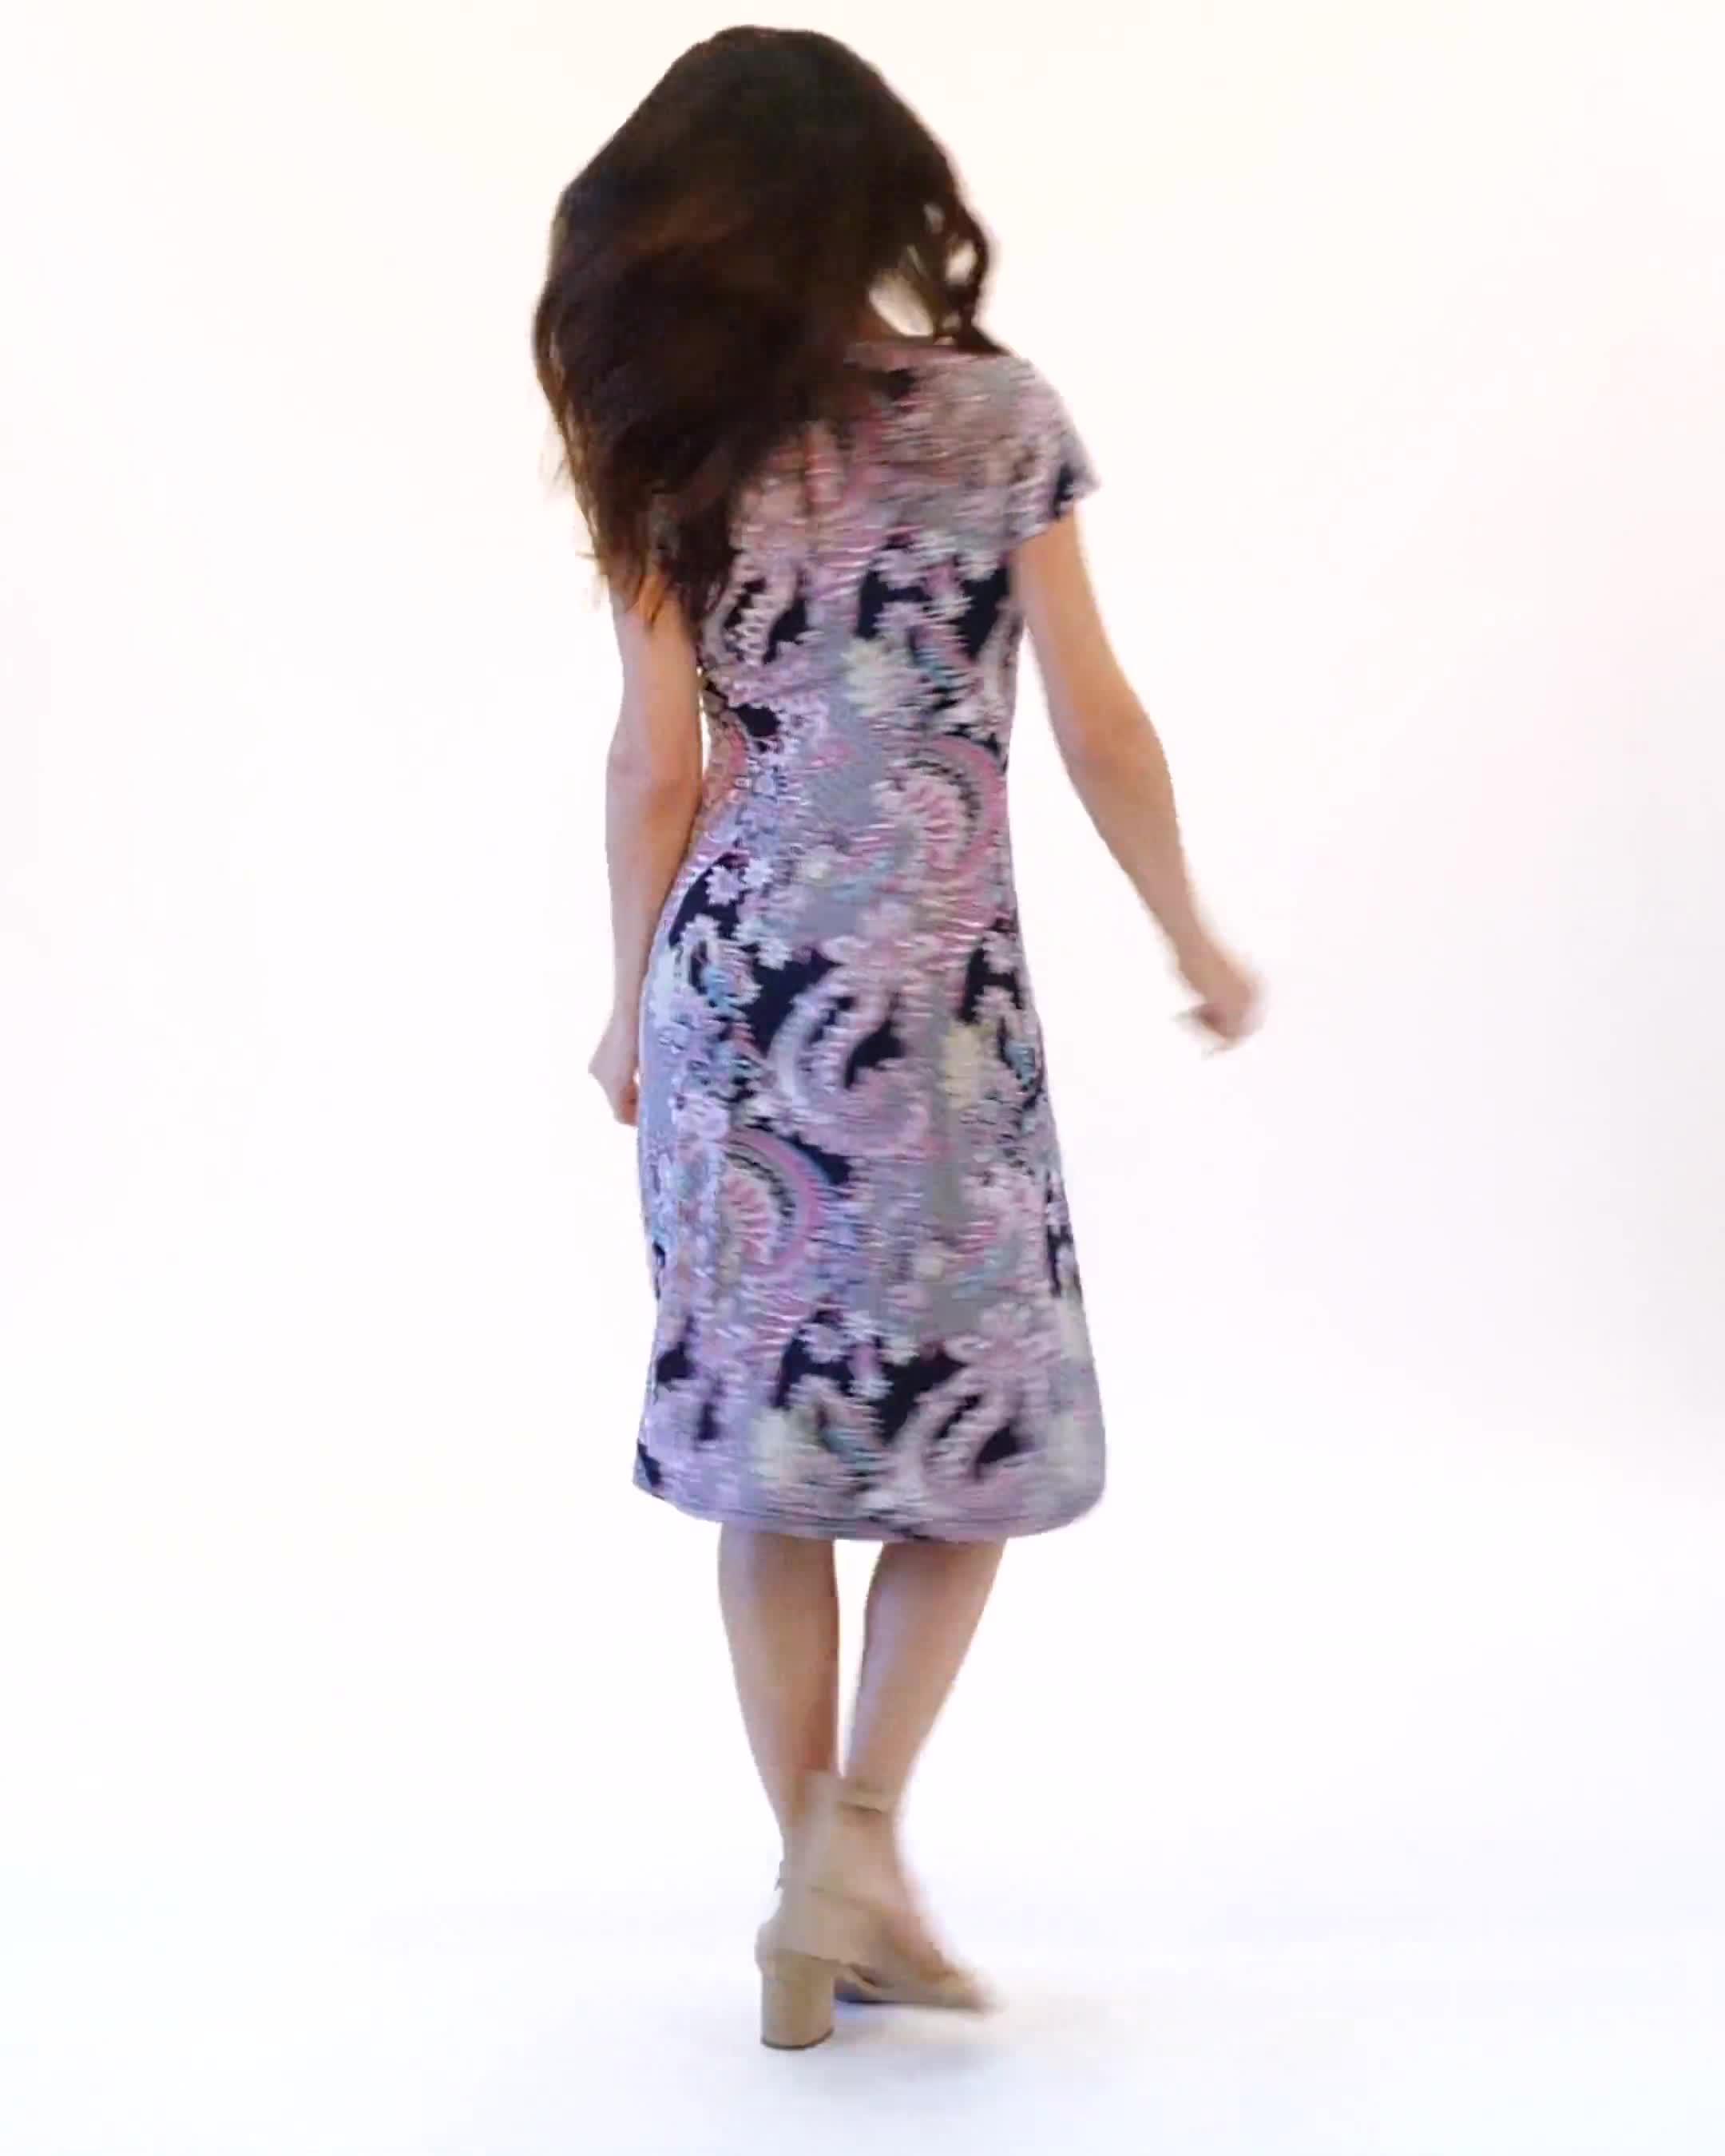 Paisley Seam Detail Dress - Video